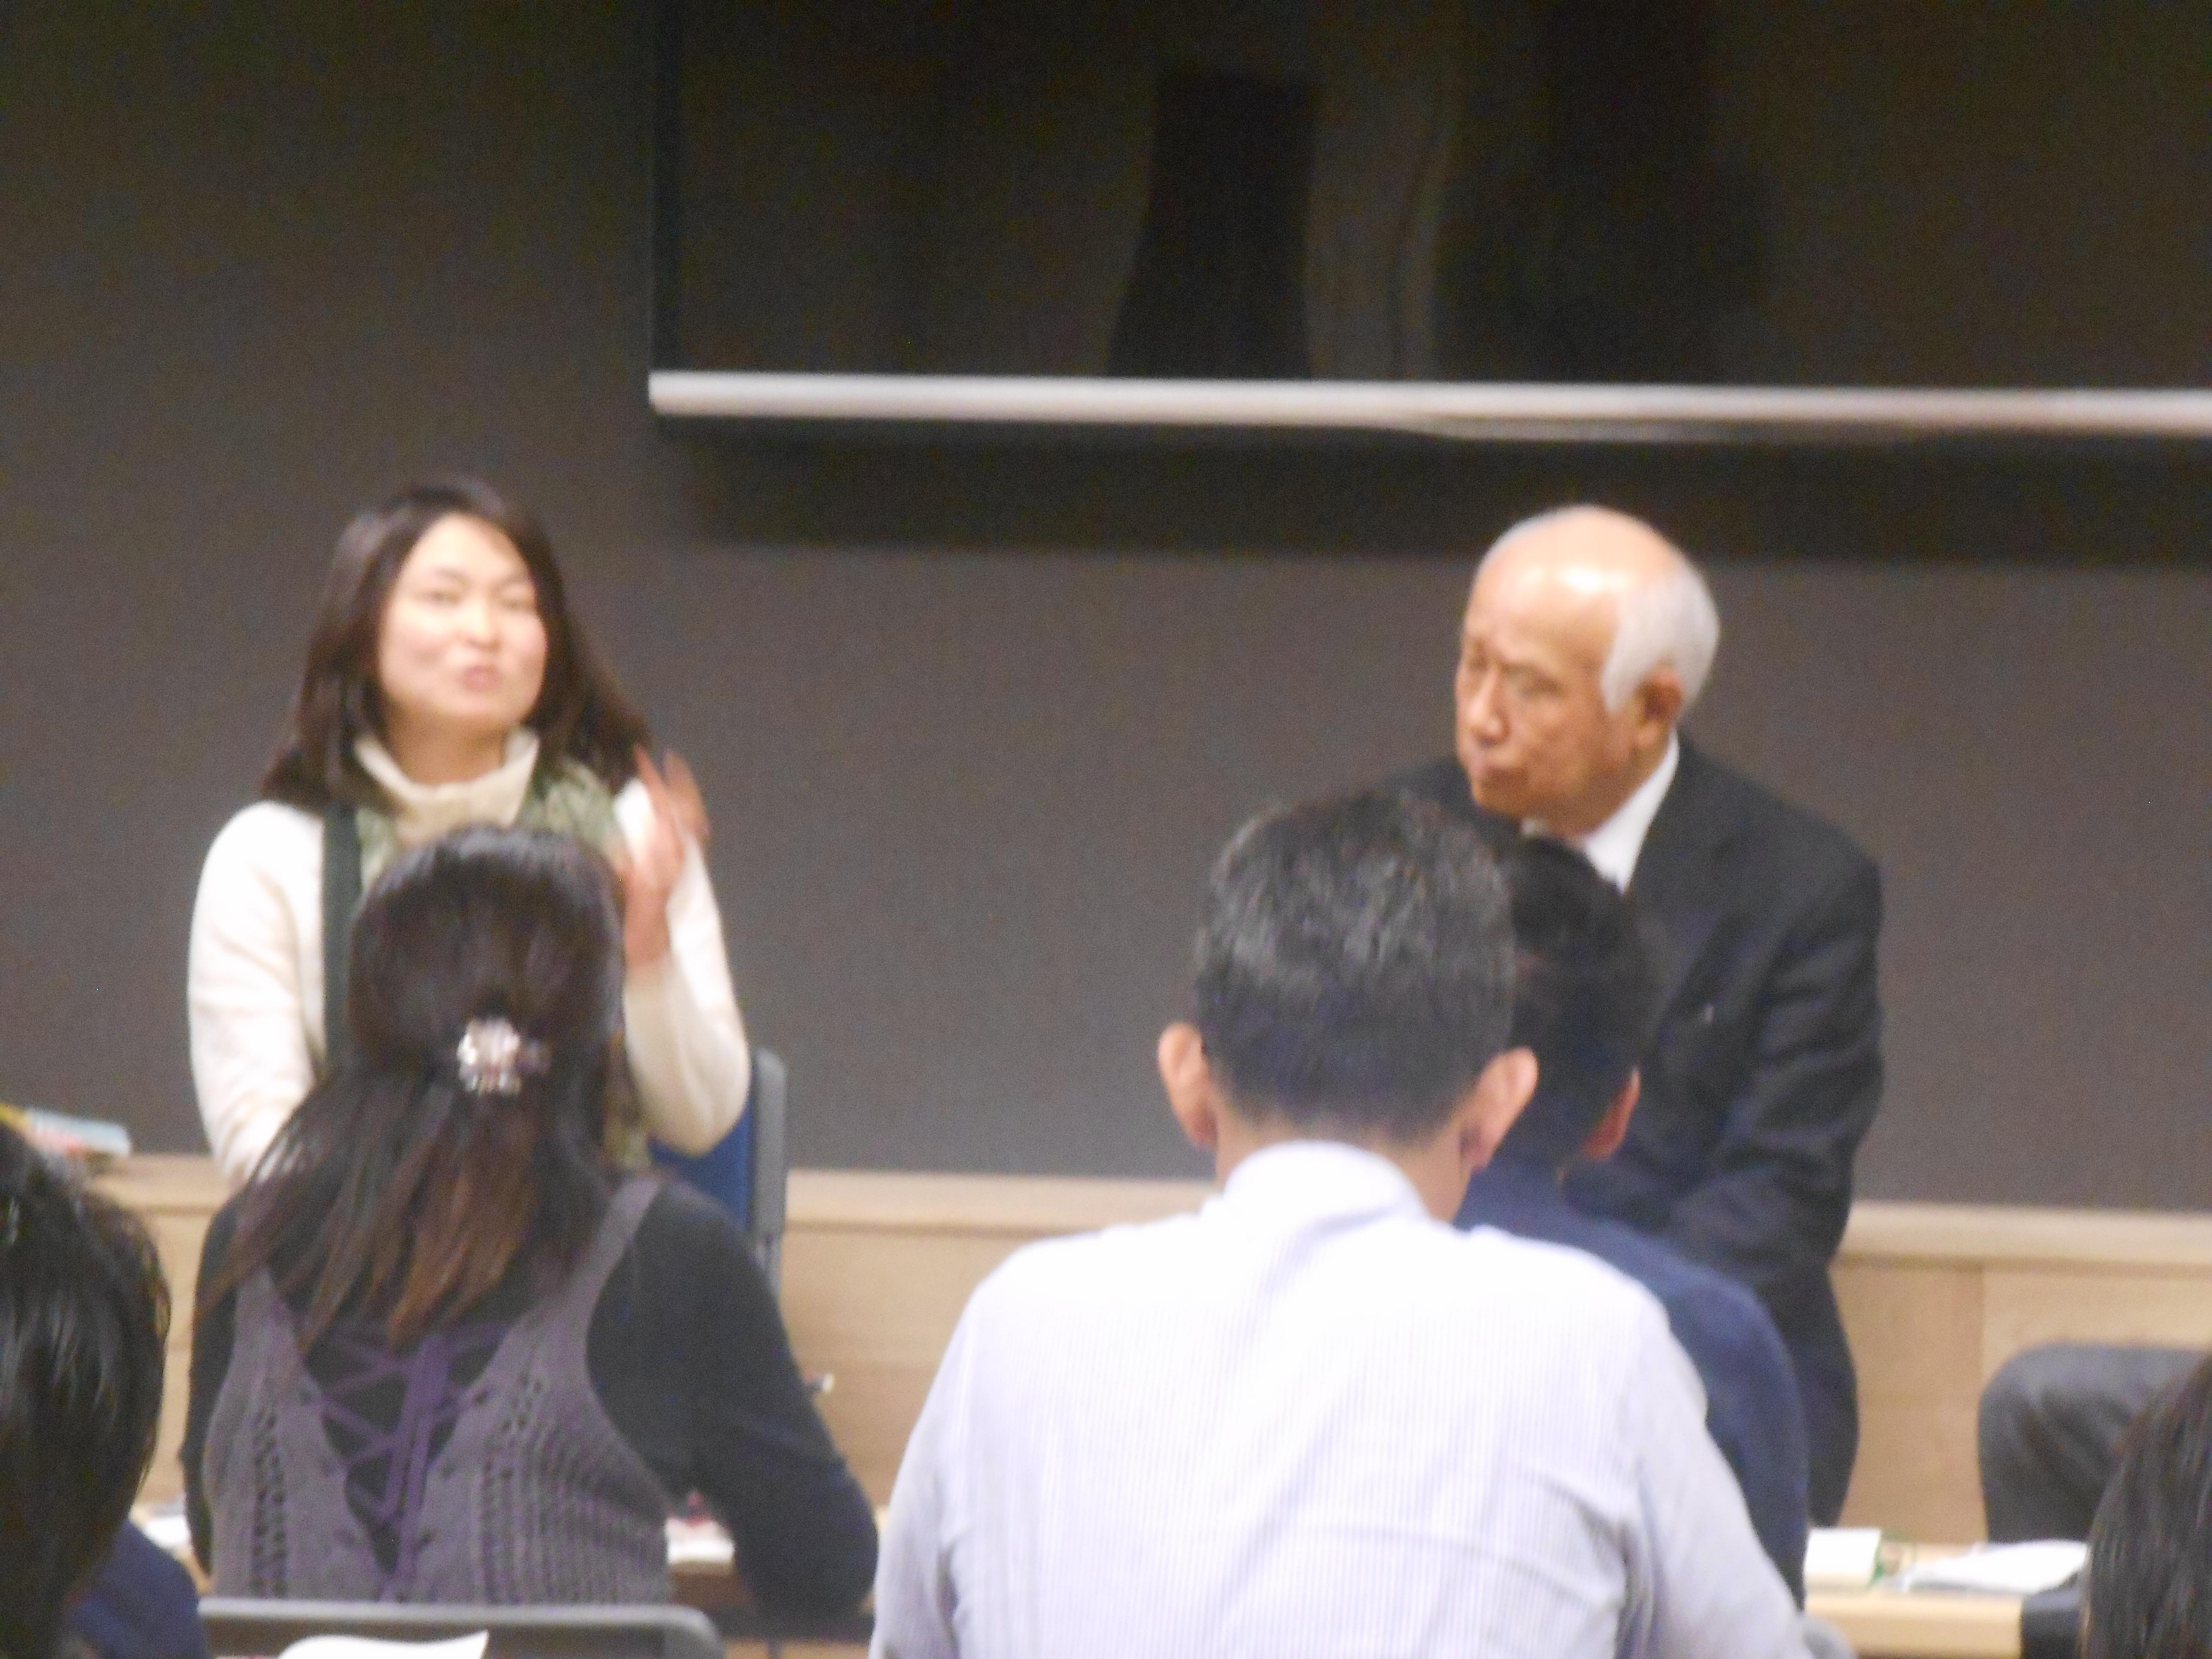 DSCN0481 1 - 平成30年度 東京思風塾 4月7日(土)「時代が問題をつくり、問題が人物をつくる」